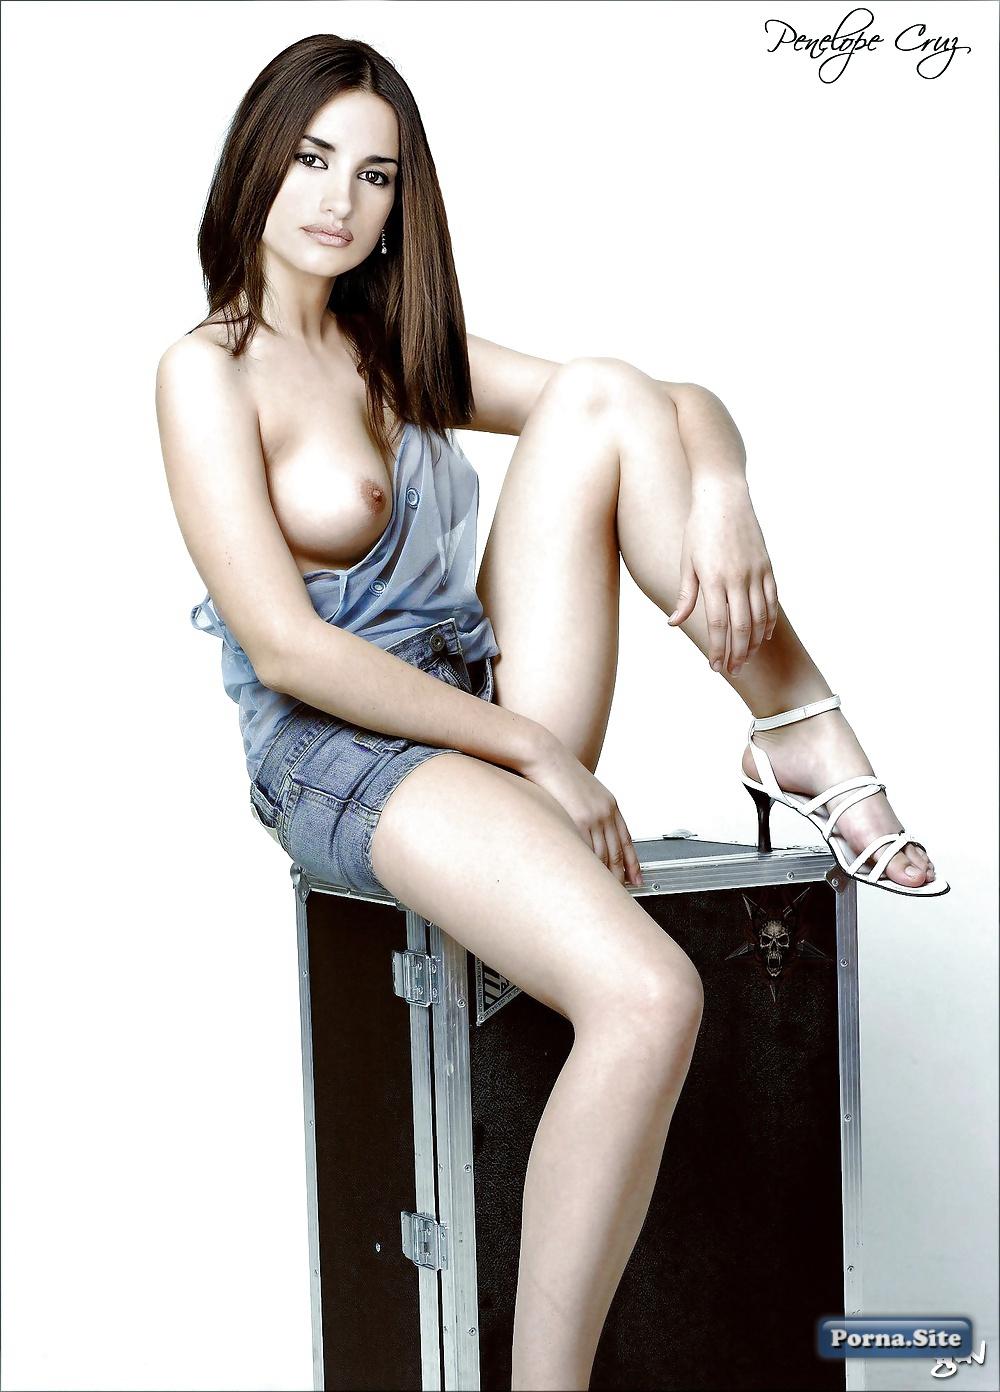 Penelope Cruz 33